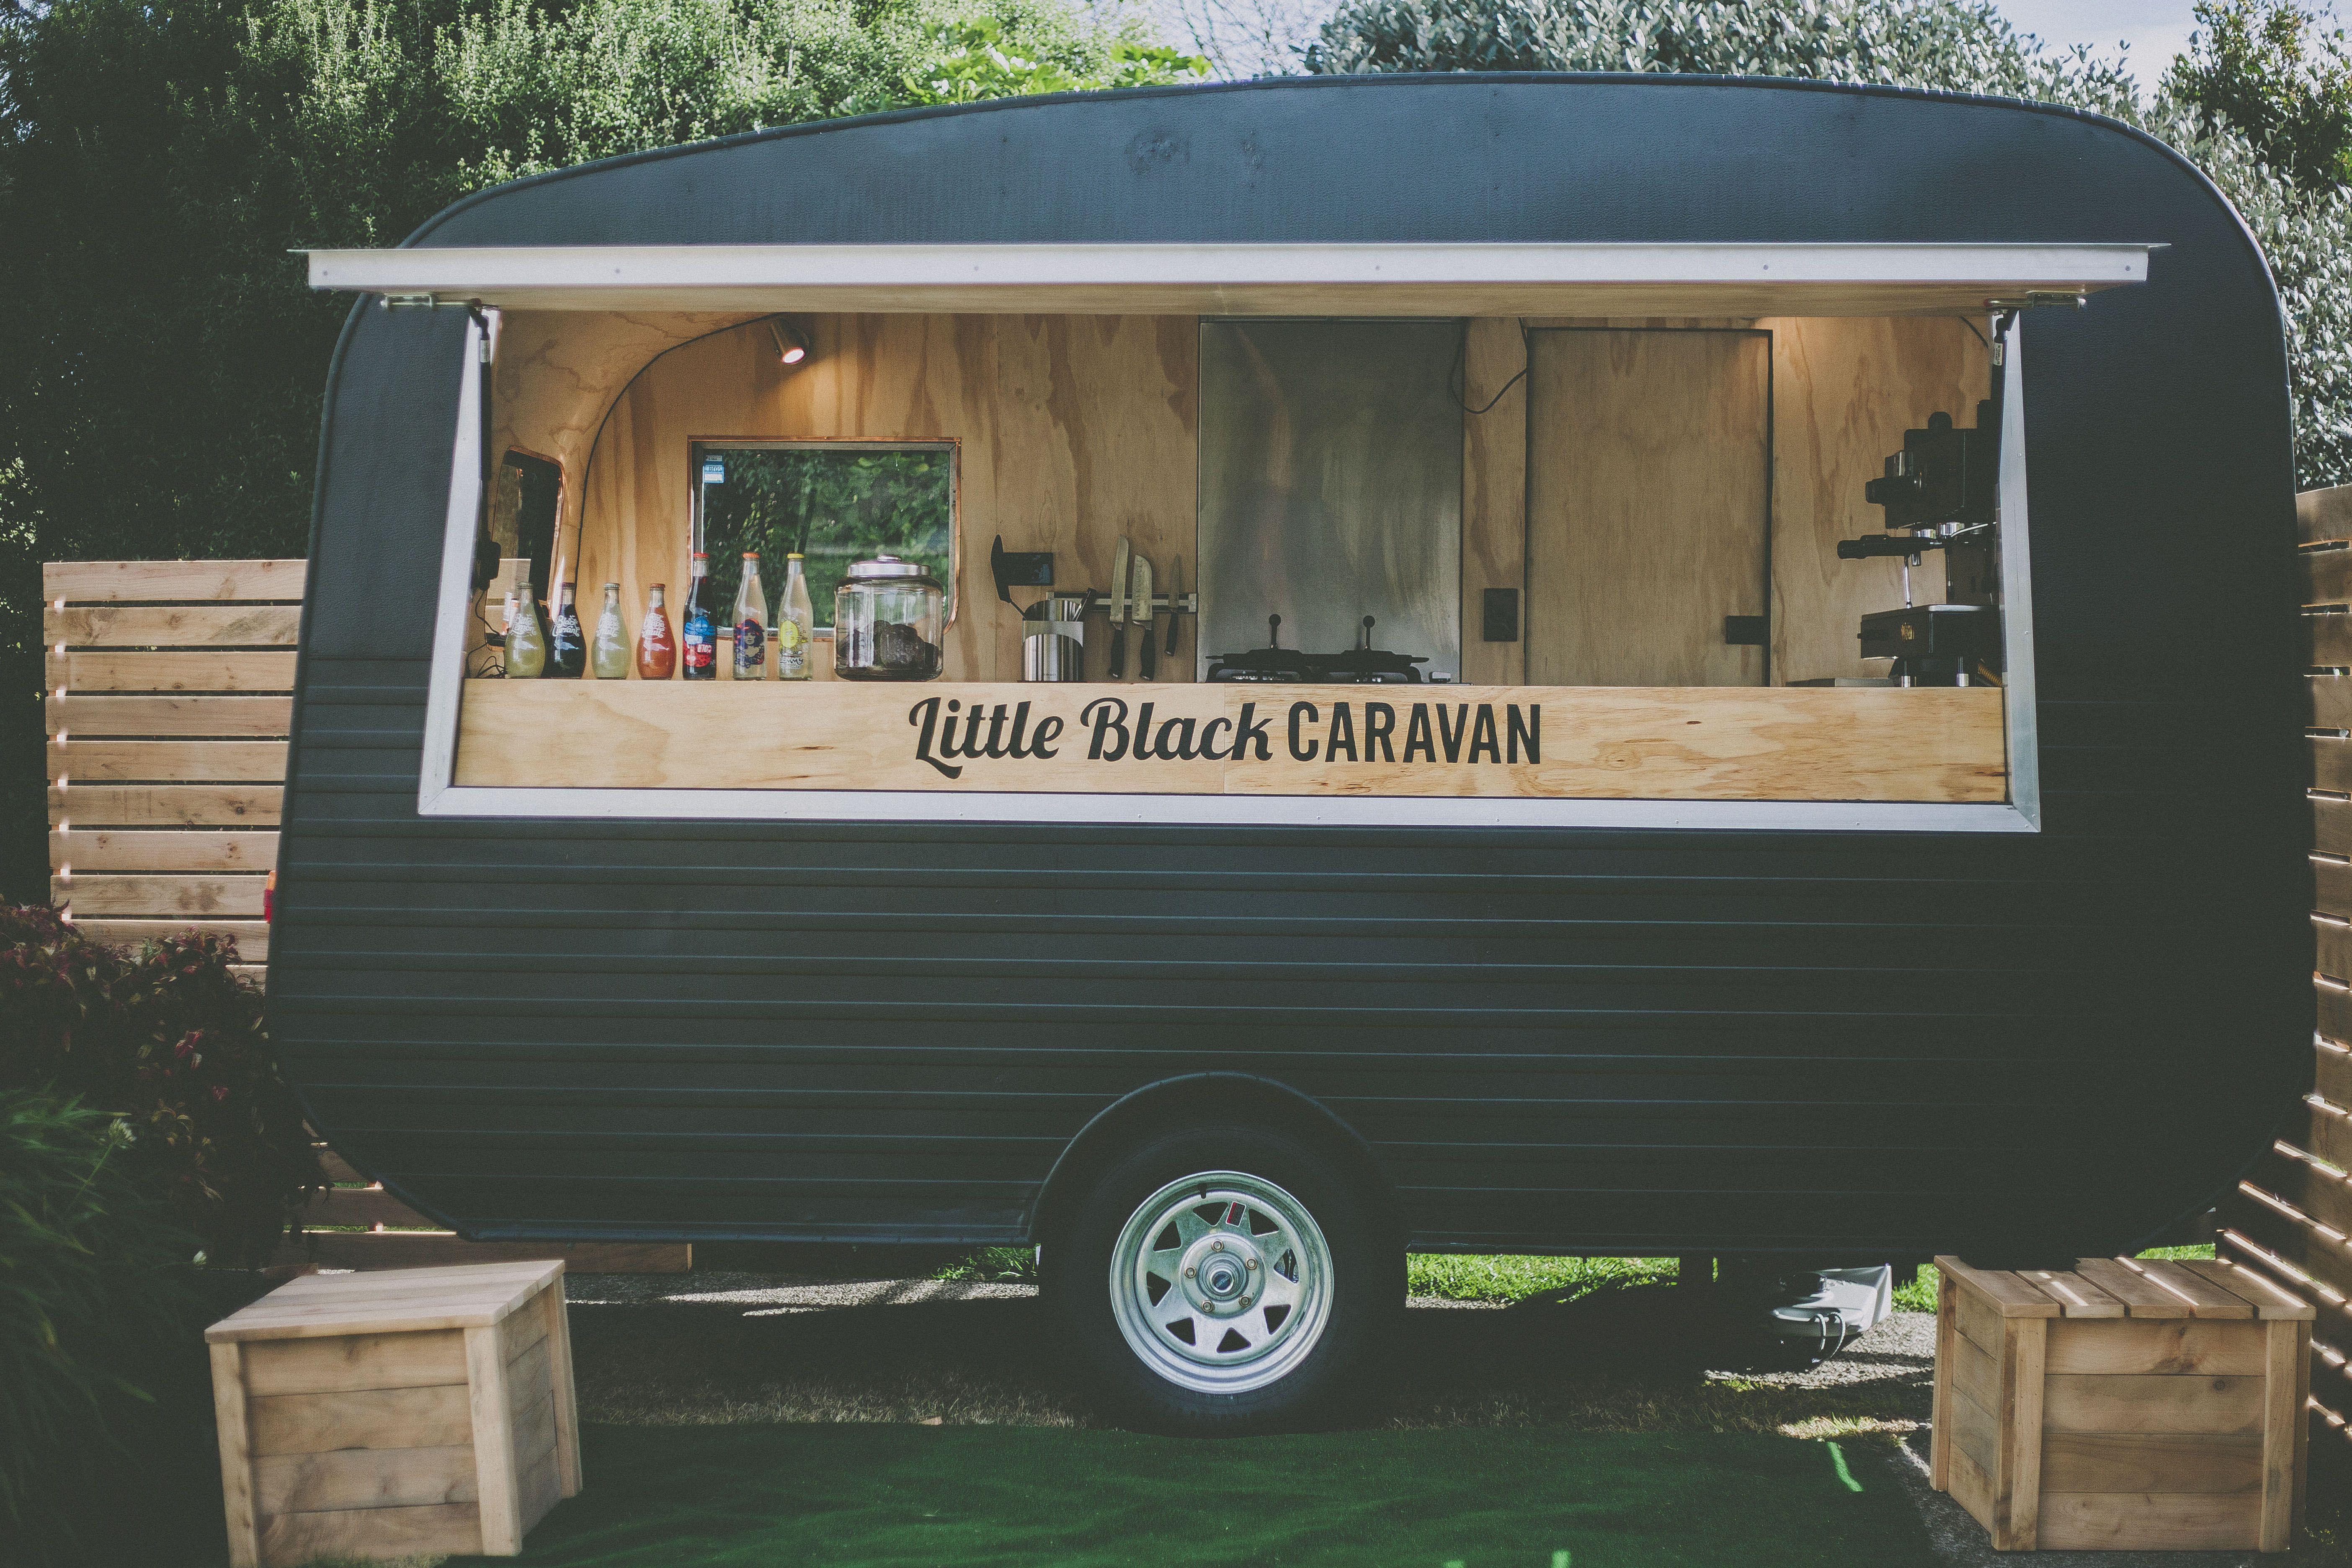 coffee van little black caravan littleblackcaravan. Black Bedroom Furniture Sets. Home Design Ideas